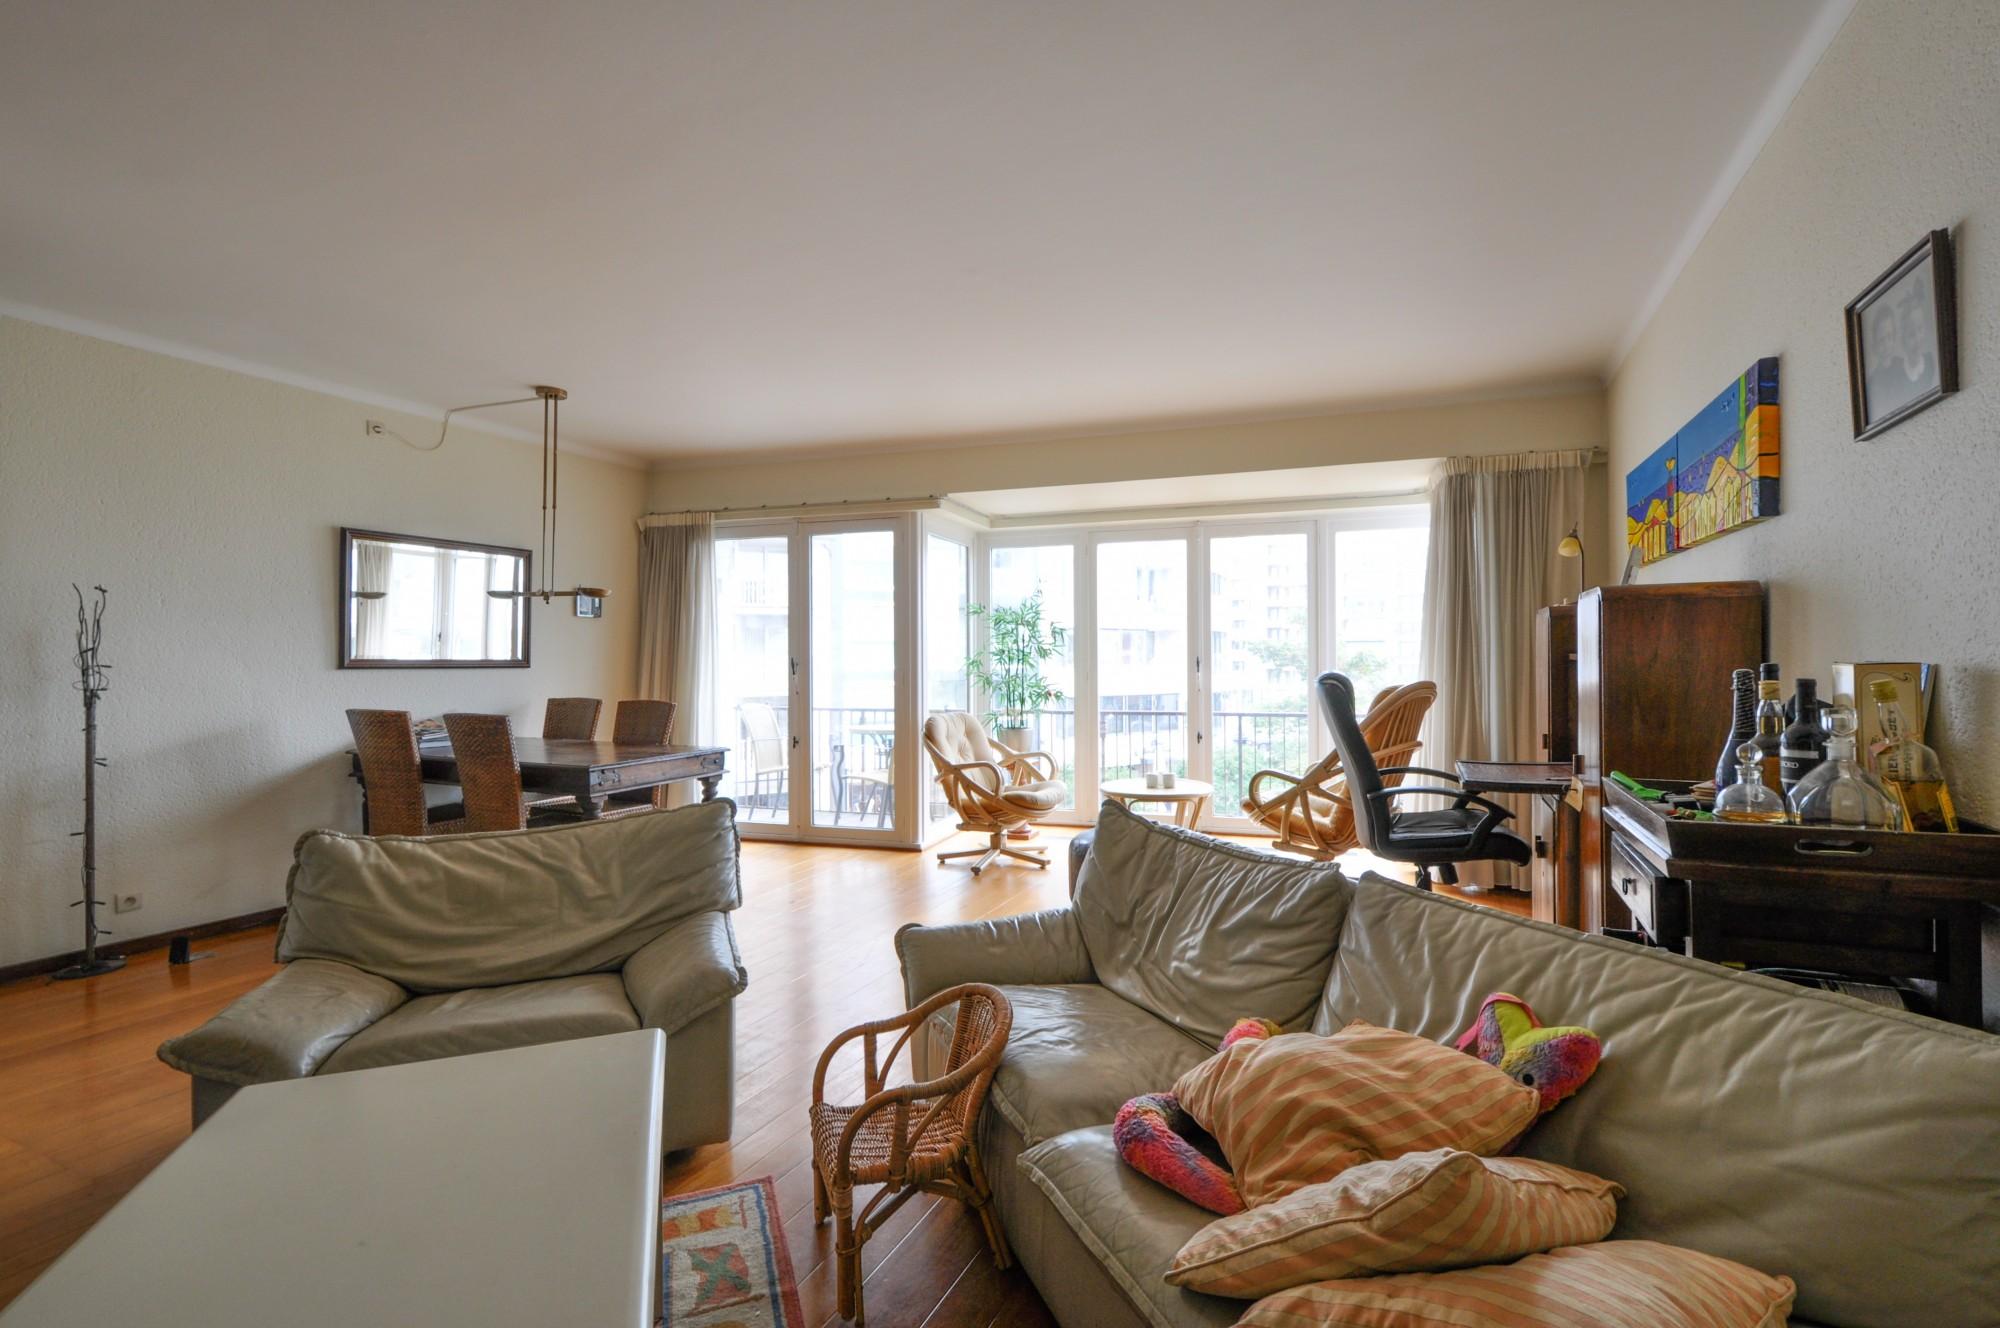 Ventes appartement t3 f3 knokke heist hedendaags for Exterieur contemporain